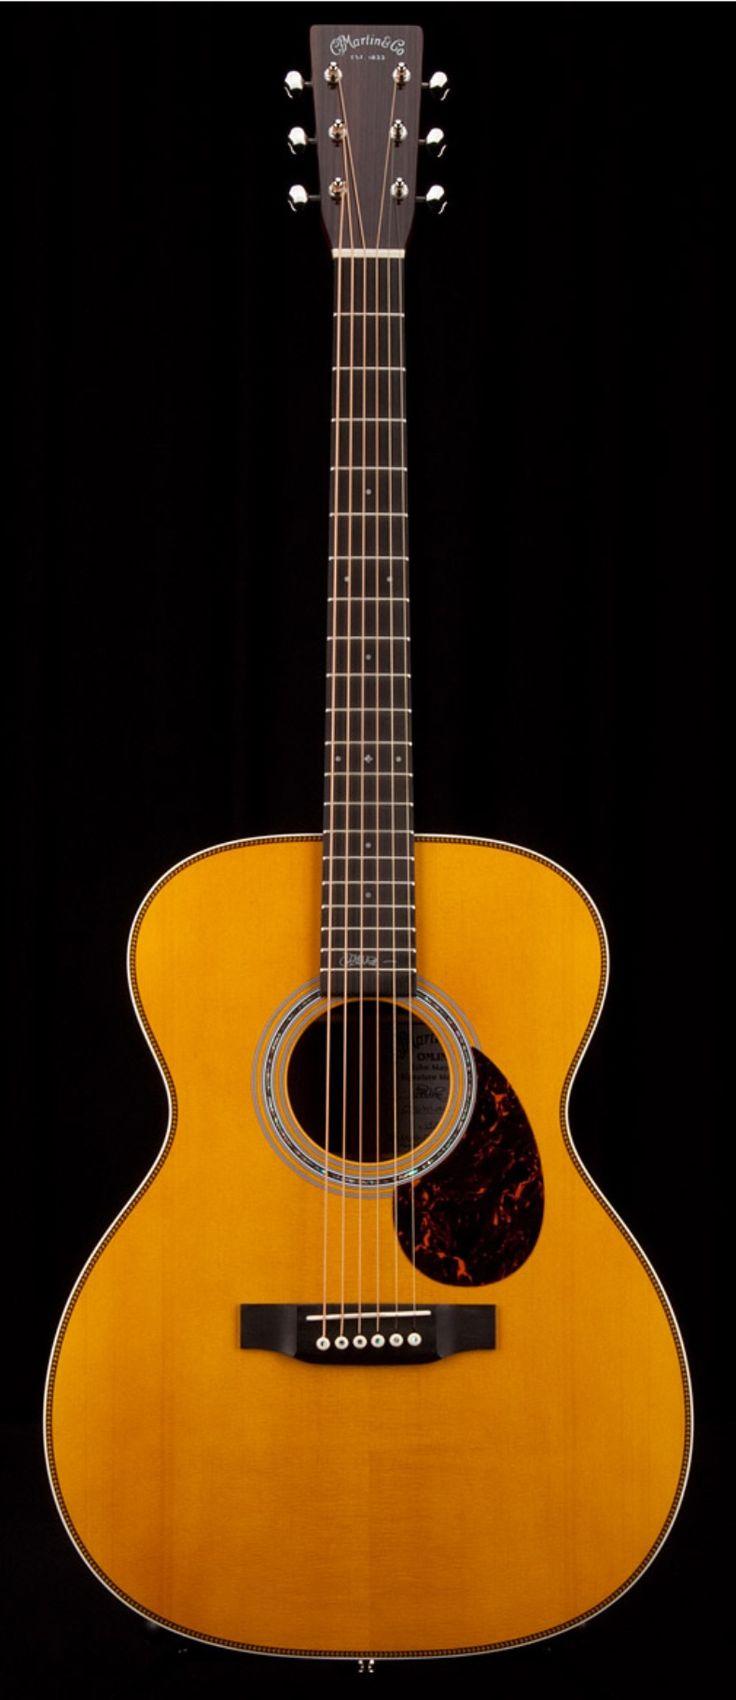 MARTIN Special Edition John Mayer Orchestra Model (via Guitar Center)